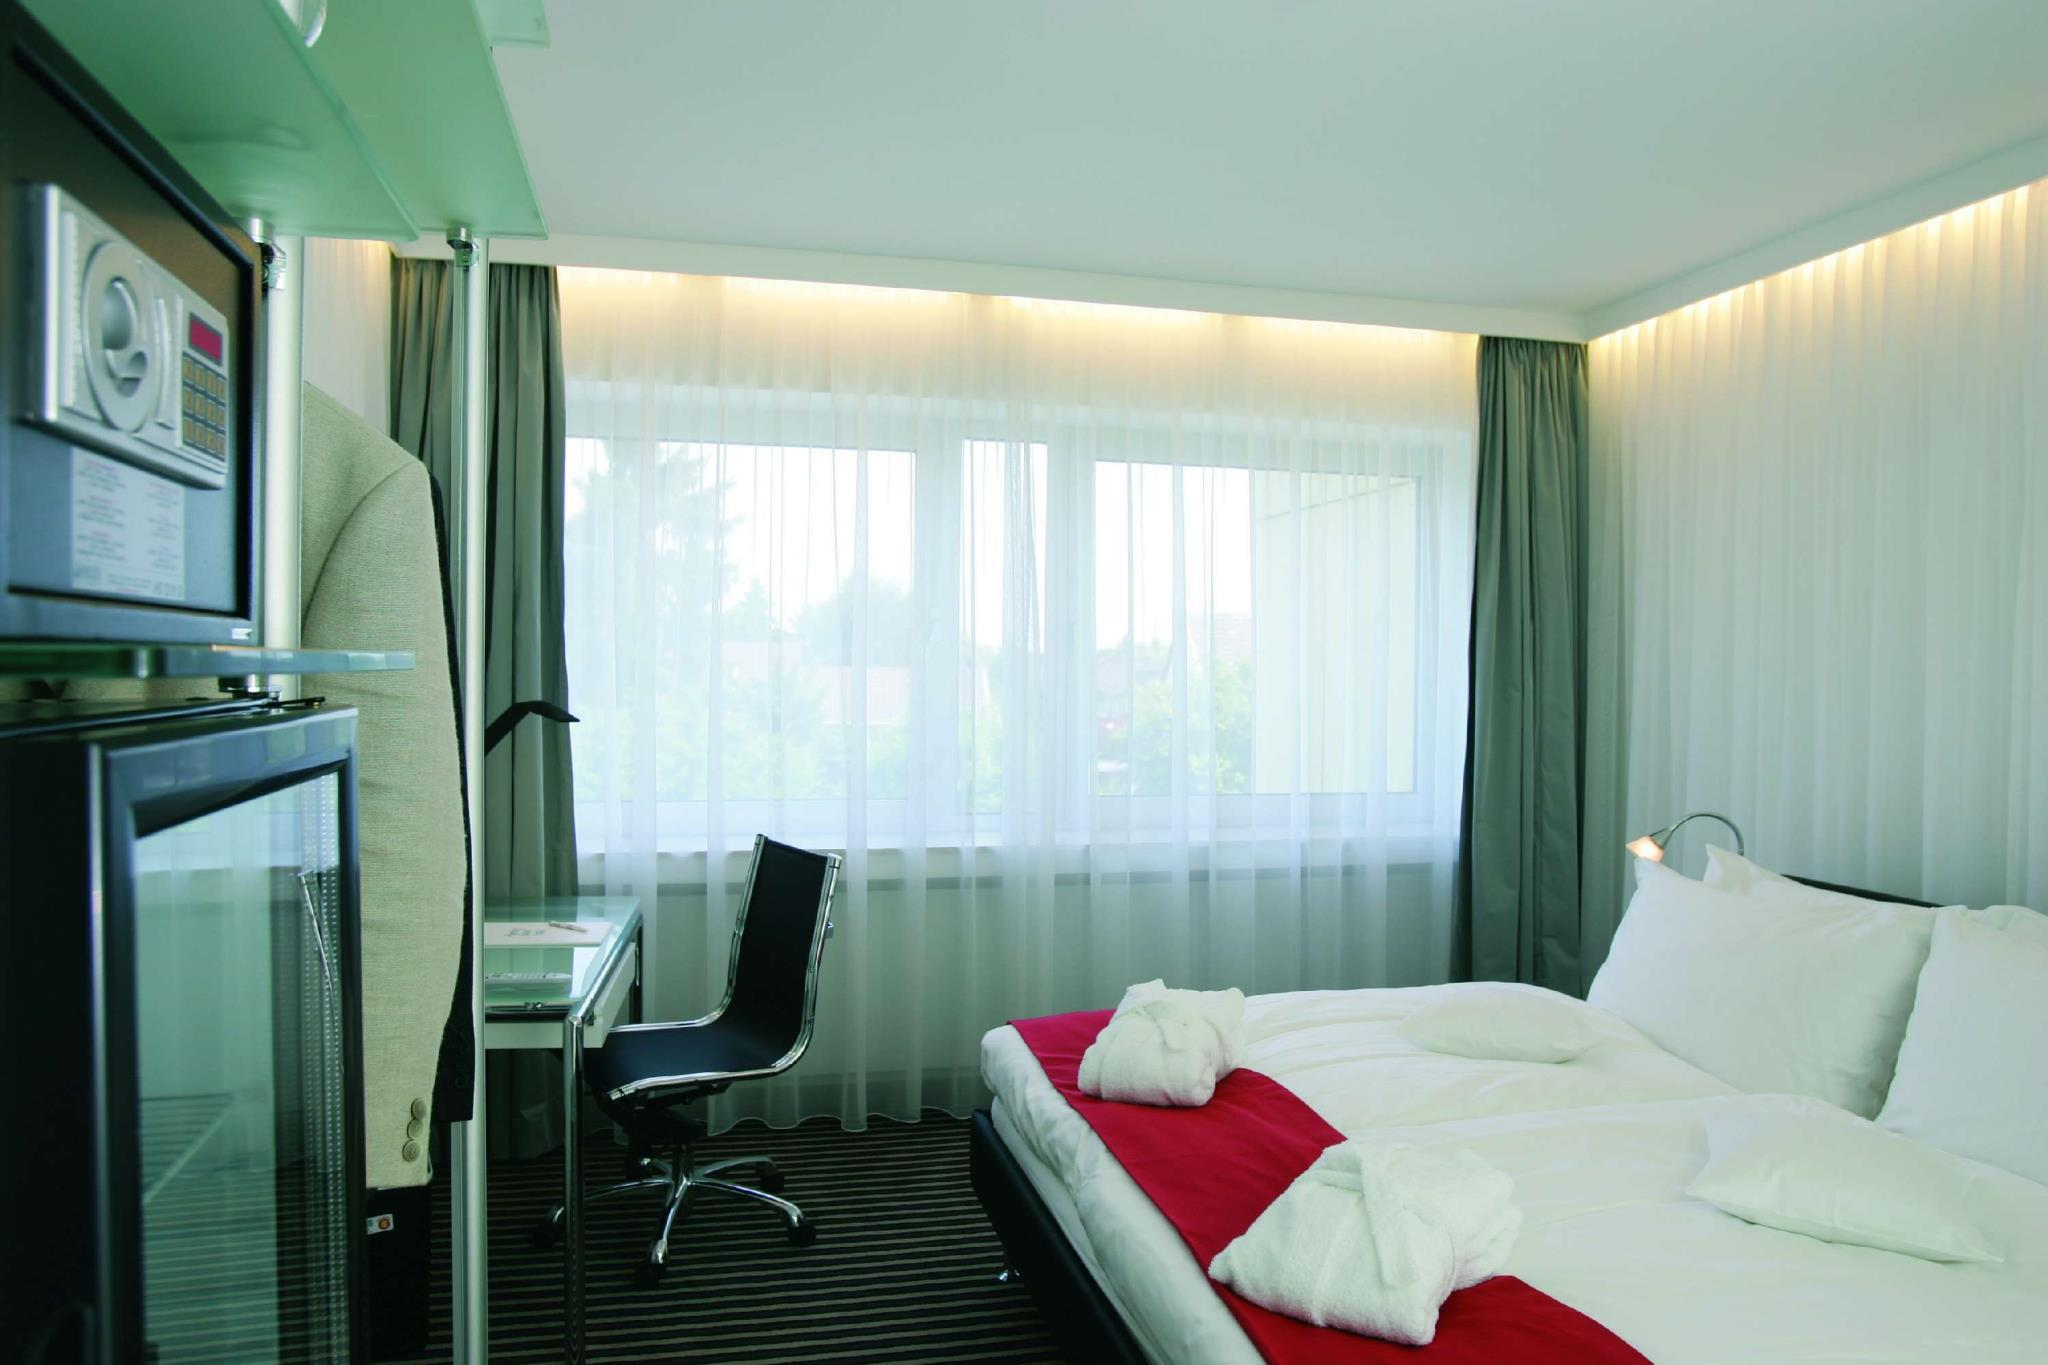 Galerie Design Hotel Bonn Managed By Maritim Hotels, Bonn